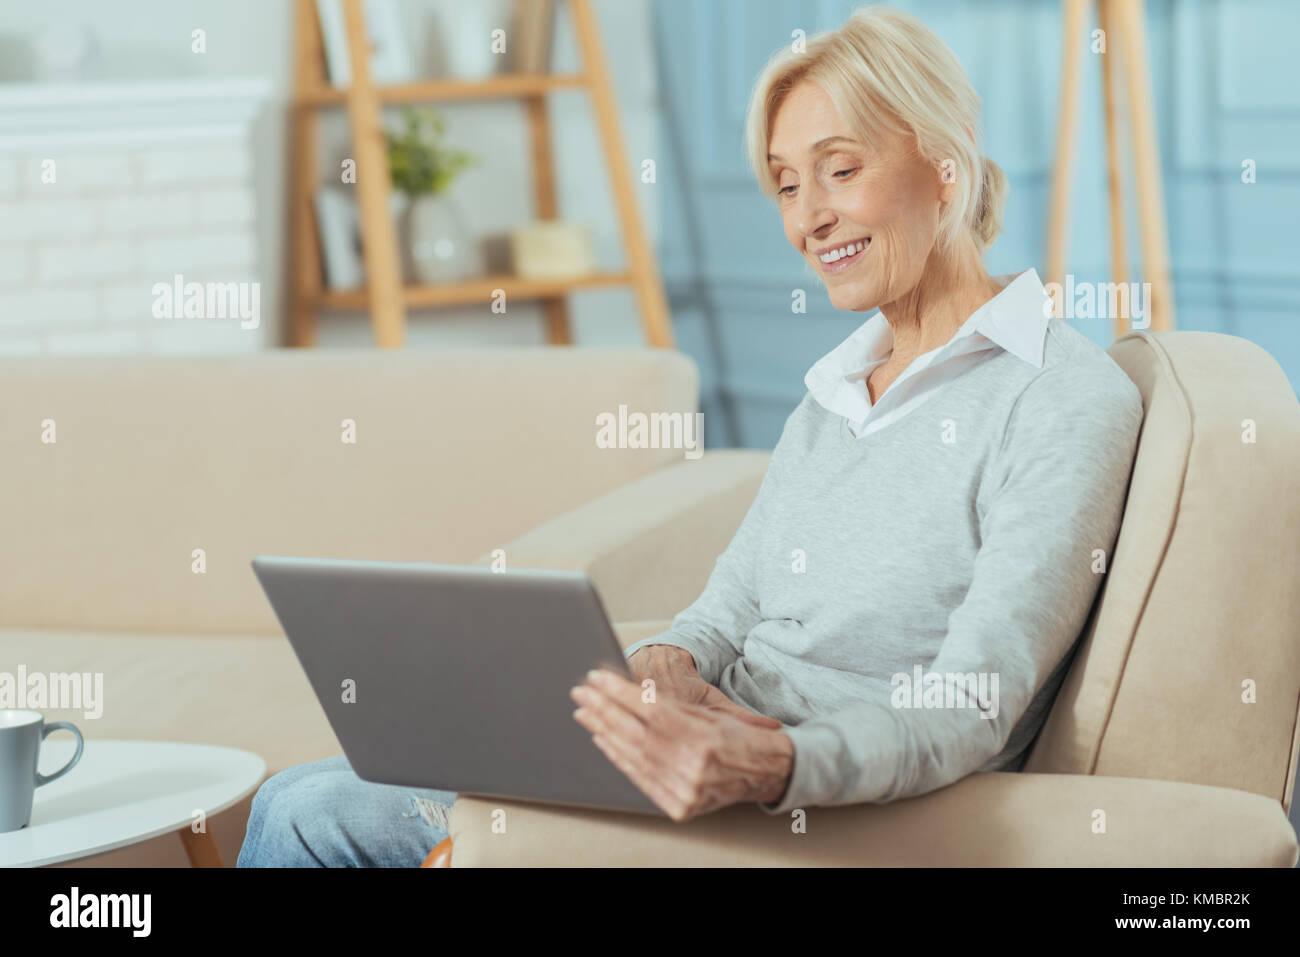 Progressive senior woman enjoying her new laptop and smiling - Stock Image